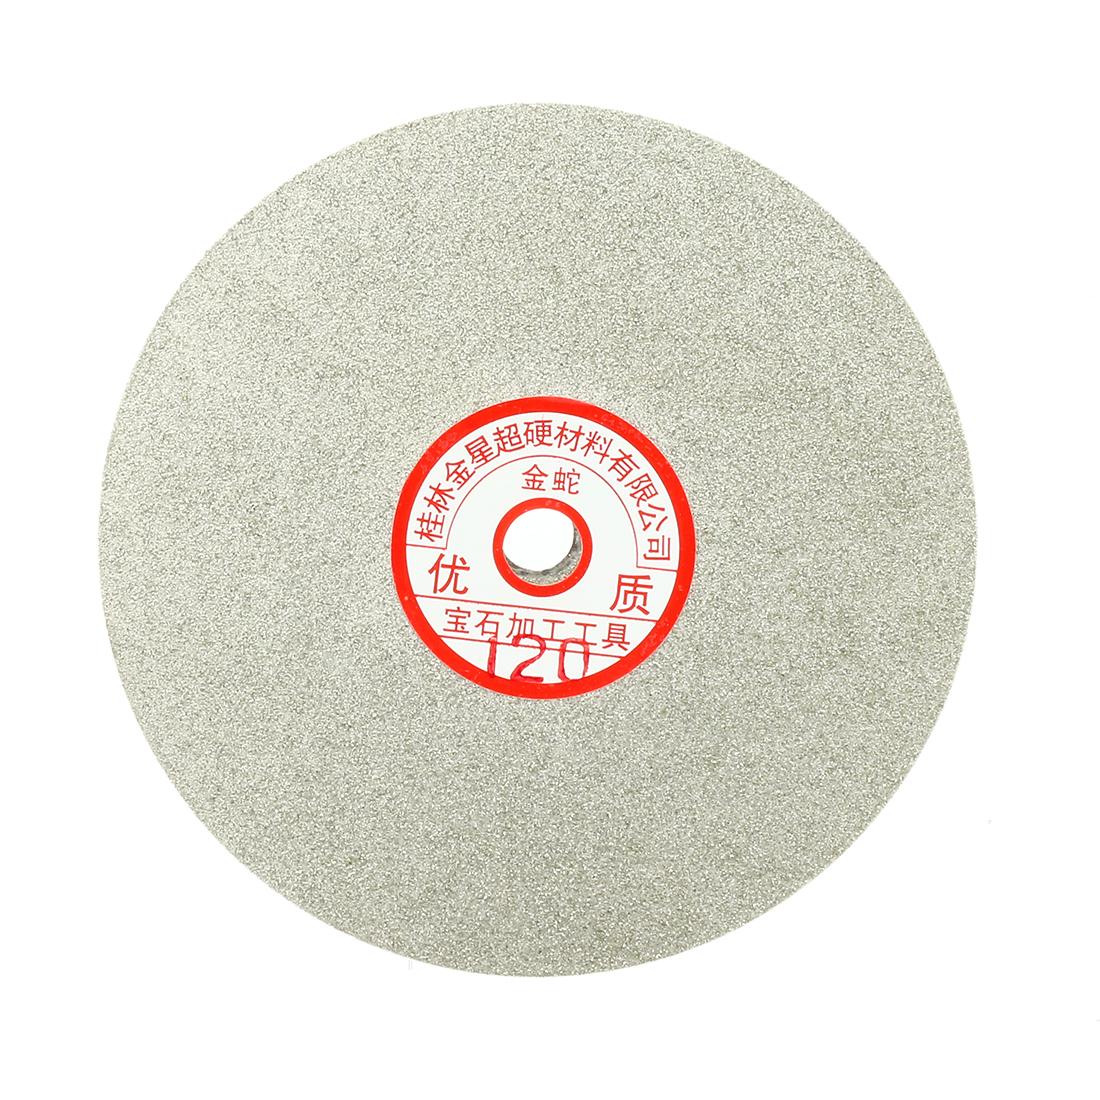 6-inch Grit 120 Diamond Coated Flat Lap Wheel Grinding Sanding Polishing Disc